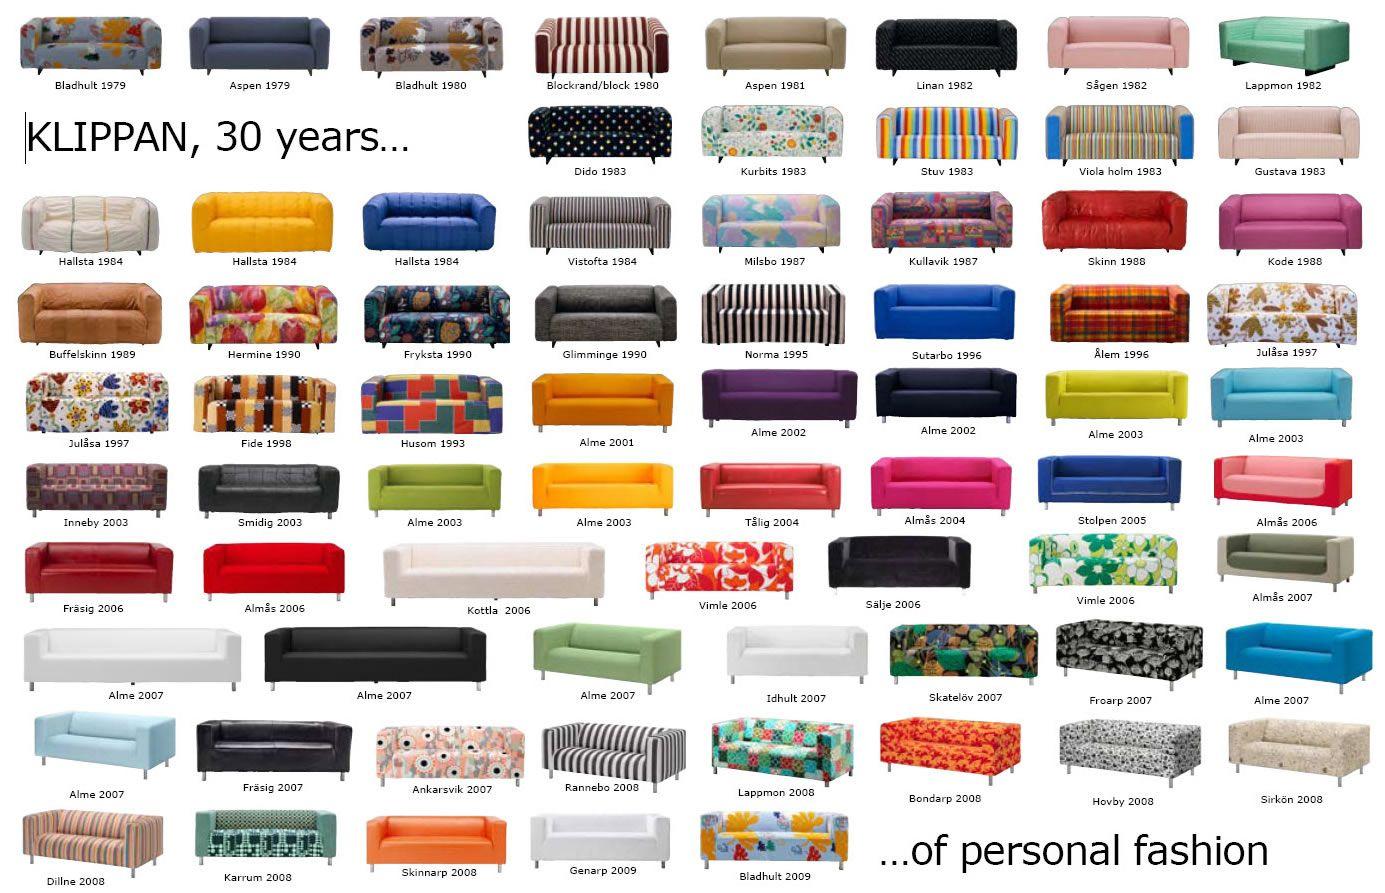 Ikea Klippan through 30 years